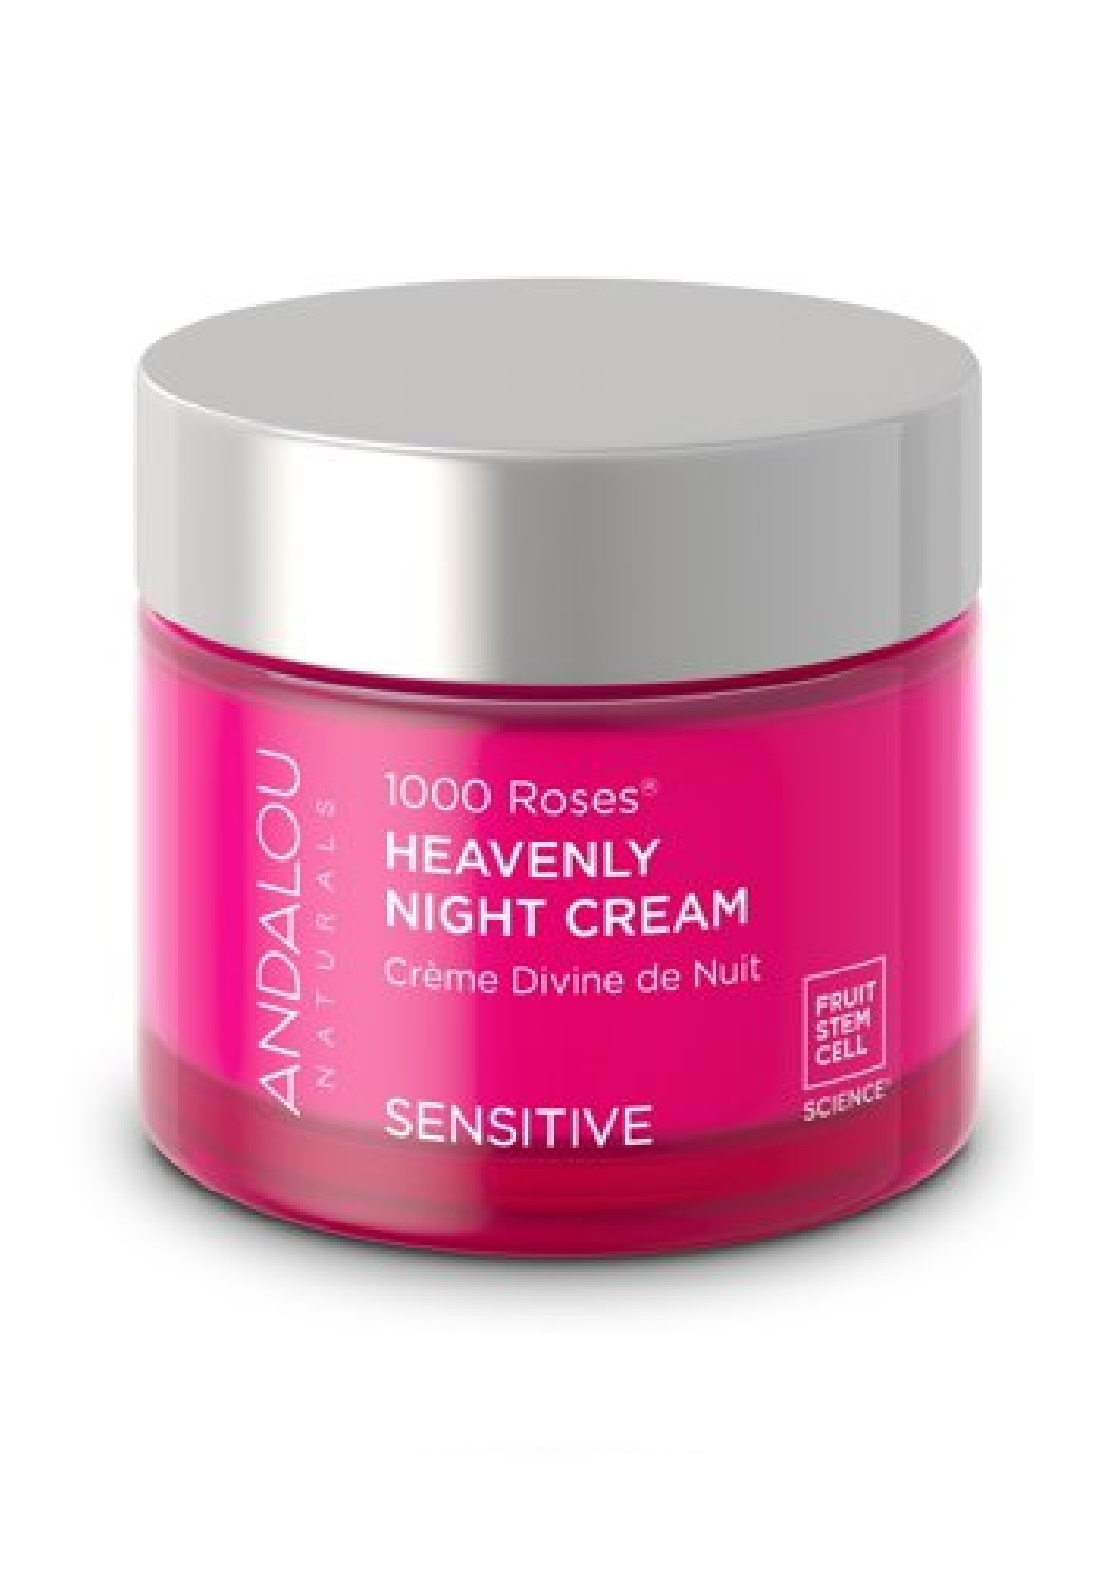 Andalou 0090 Naturals 1000 Roses Heavenly Night Cream